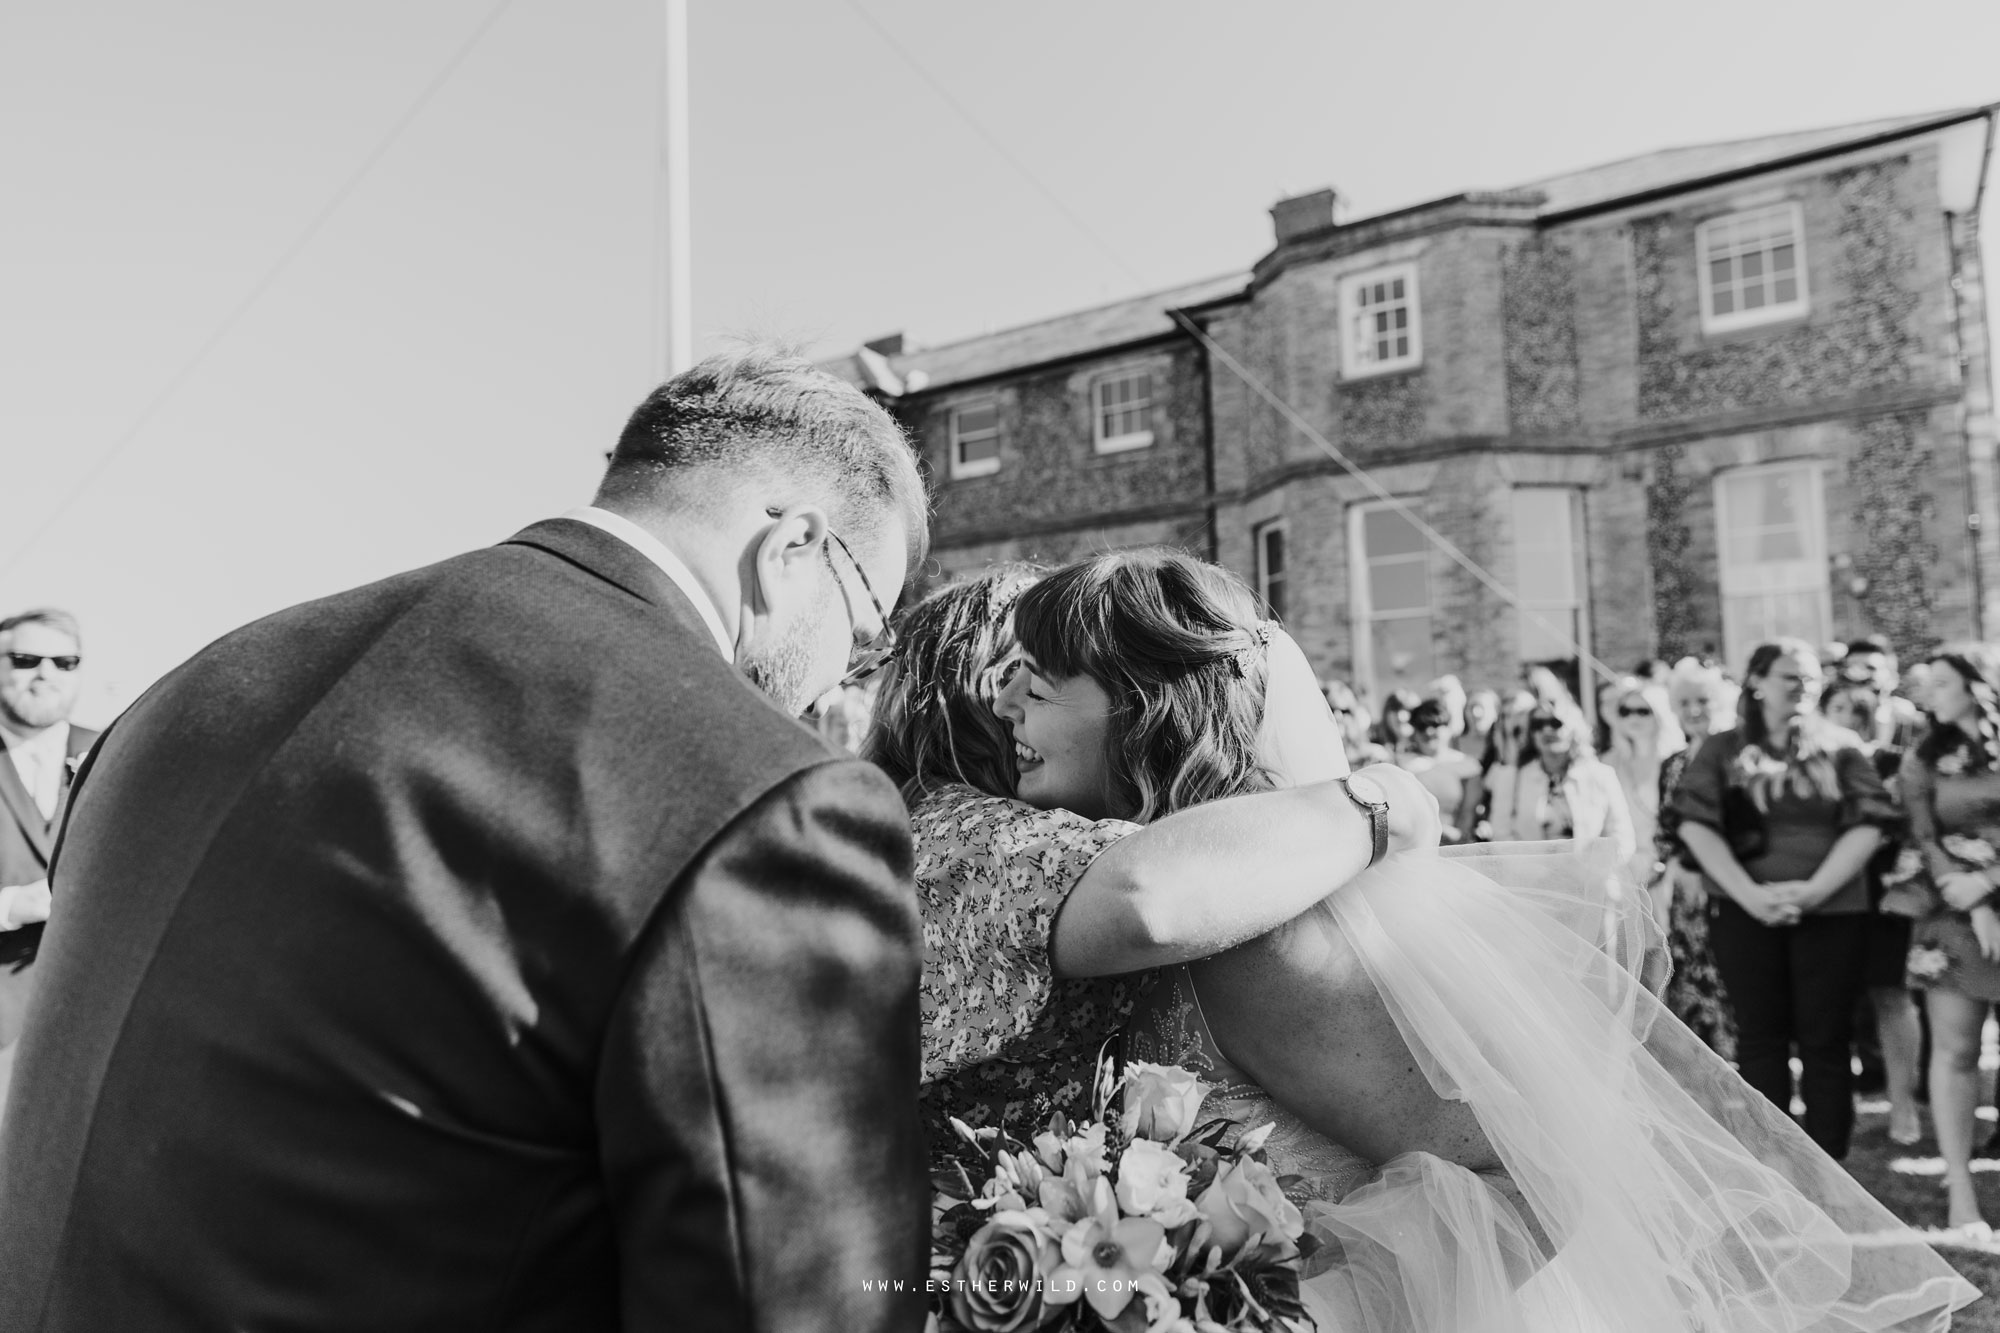 Cromer_Wedding_Beach_Outdoor_Ceremony_Norfolk_North_Lodge_Registry_Office_Rocket_House_Cafe_Cromer_Pier_IMG_3801-2.jpg